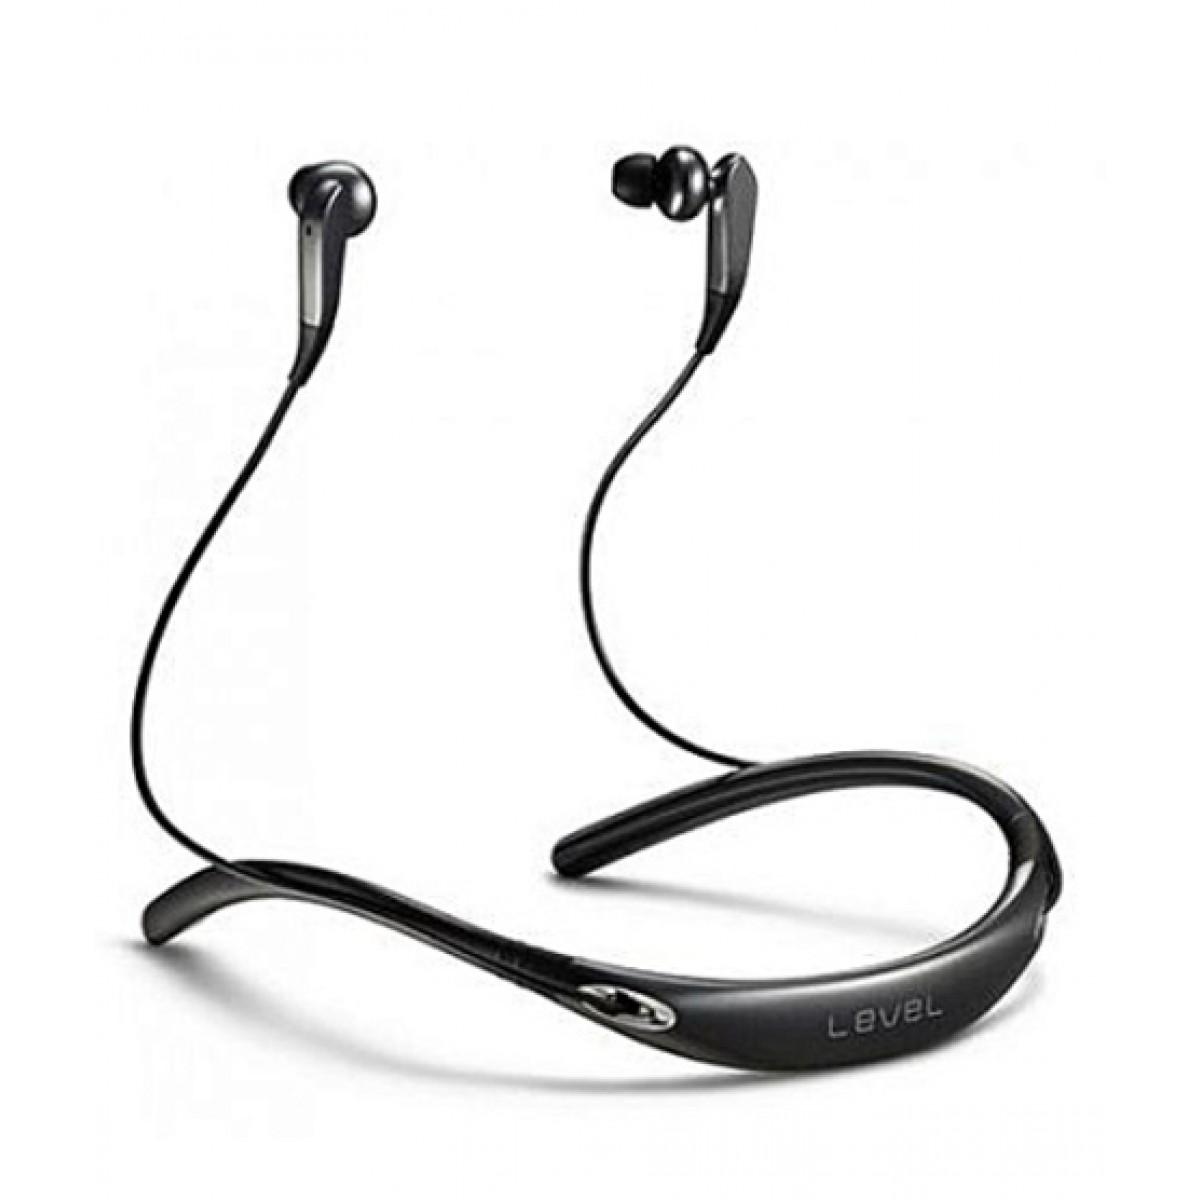 Samsung Level U Headphones Price In Pakistan Buy Samsung Level U Pro Bluetooth Wireless Headphones Black Ishopping Pk